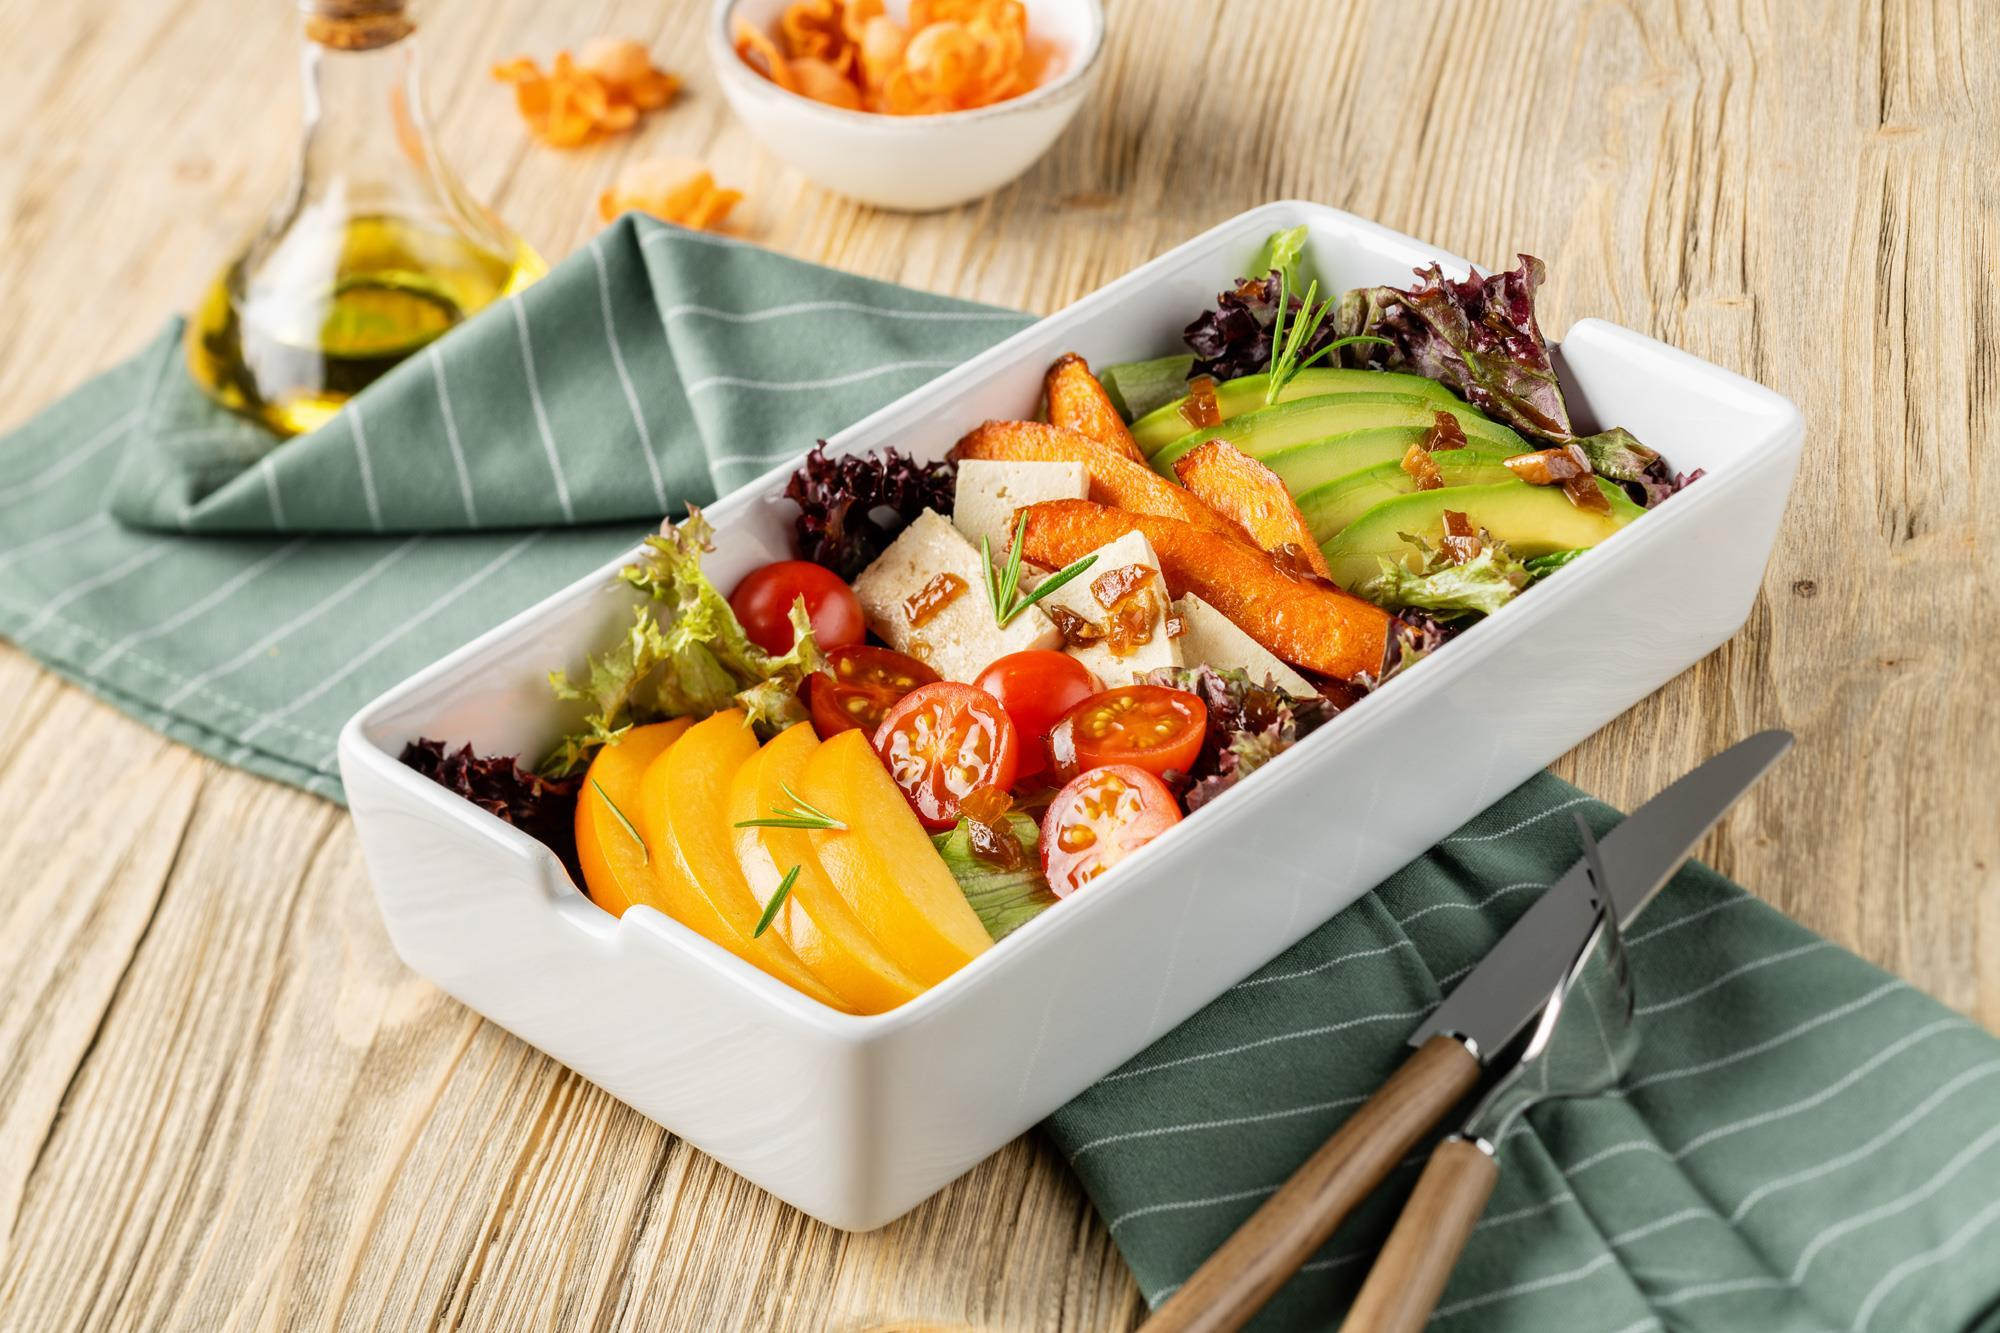 Салат с хурмой и бататом